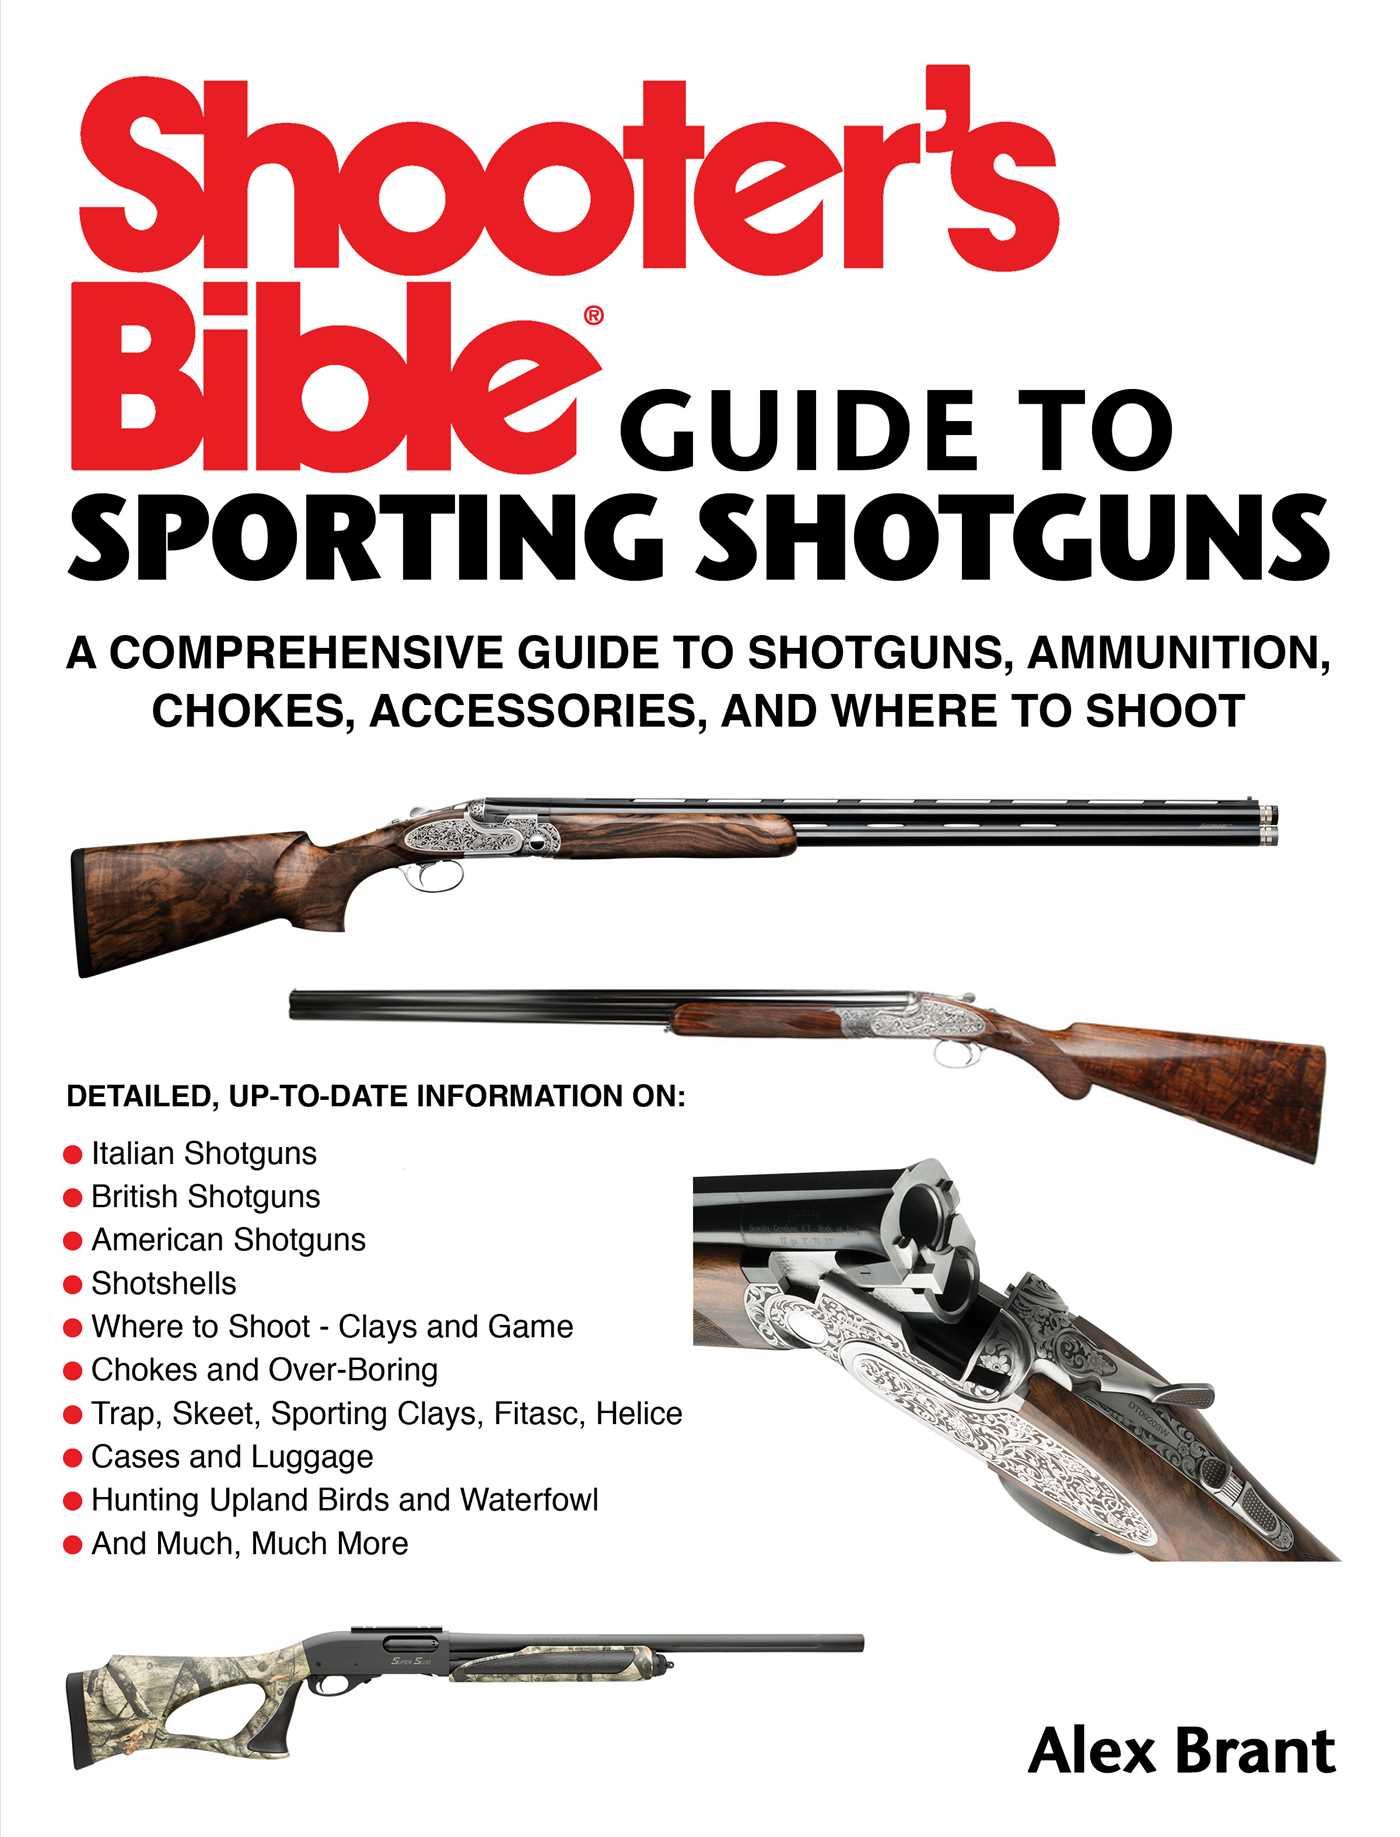 Shooters bible guide to sporting shotguns 9781510704657 hr